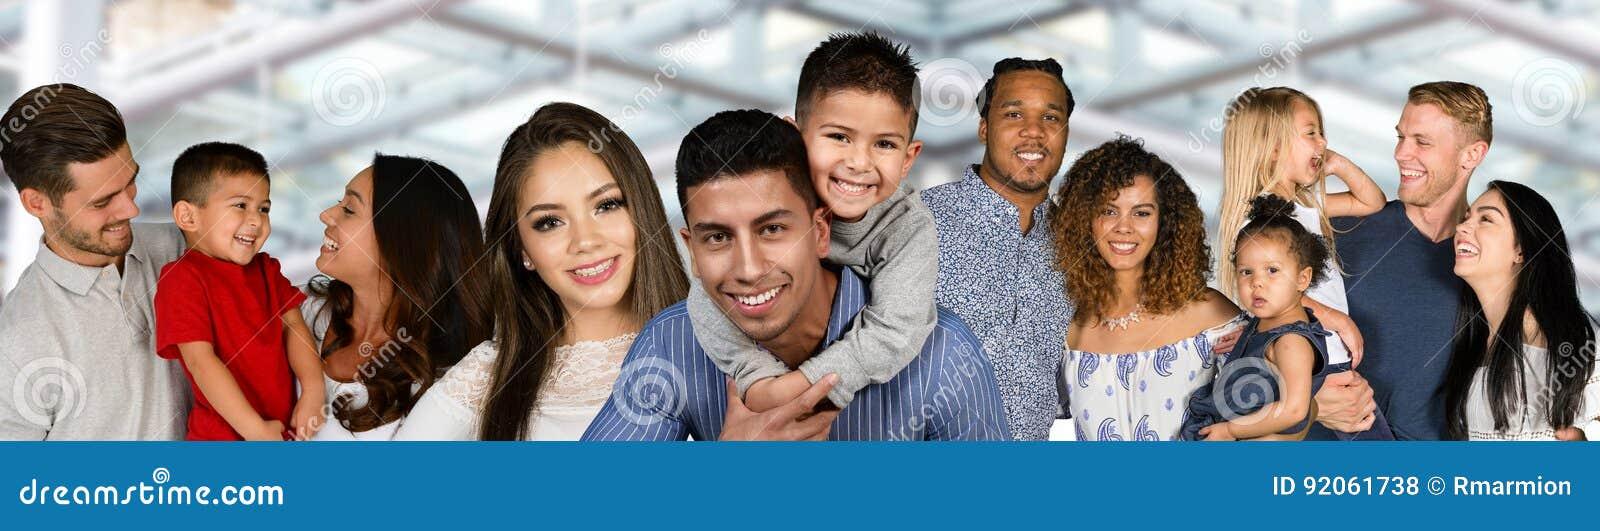 Grupo de famílias